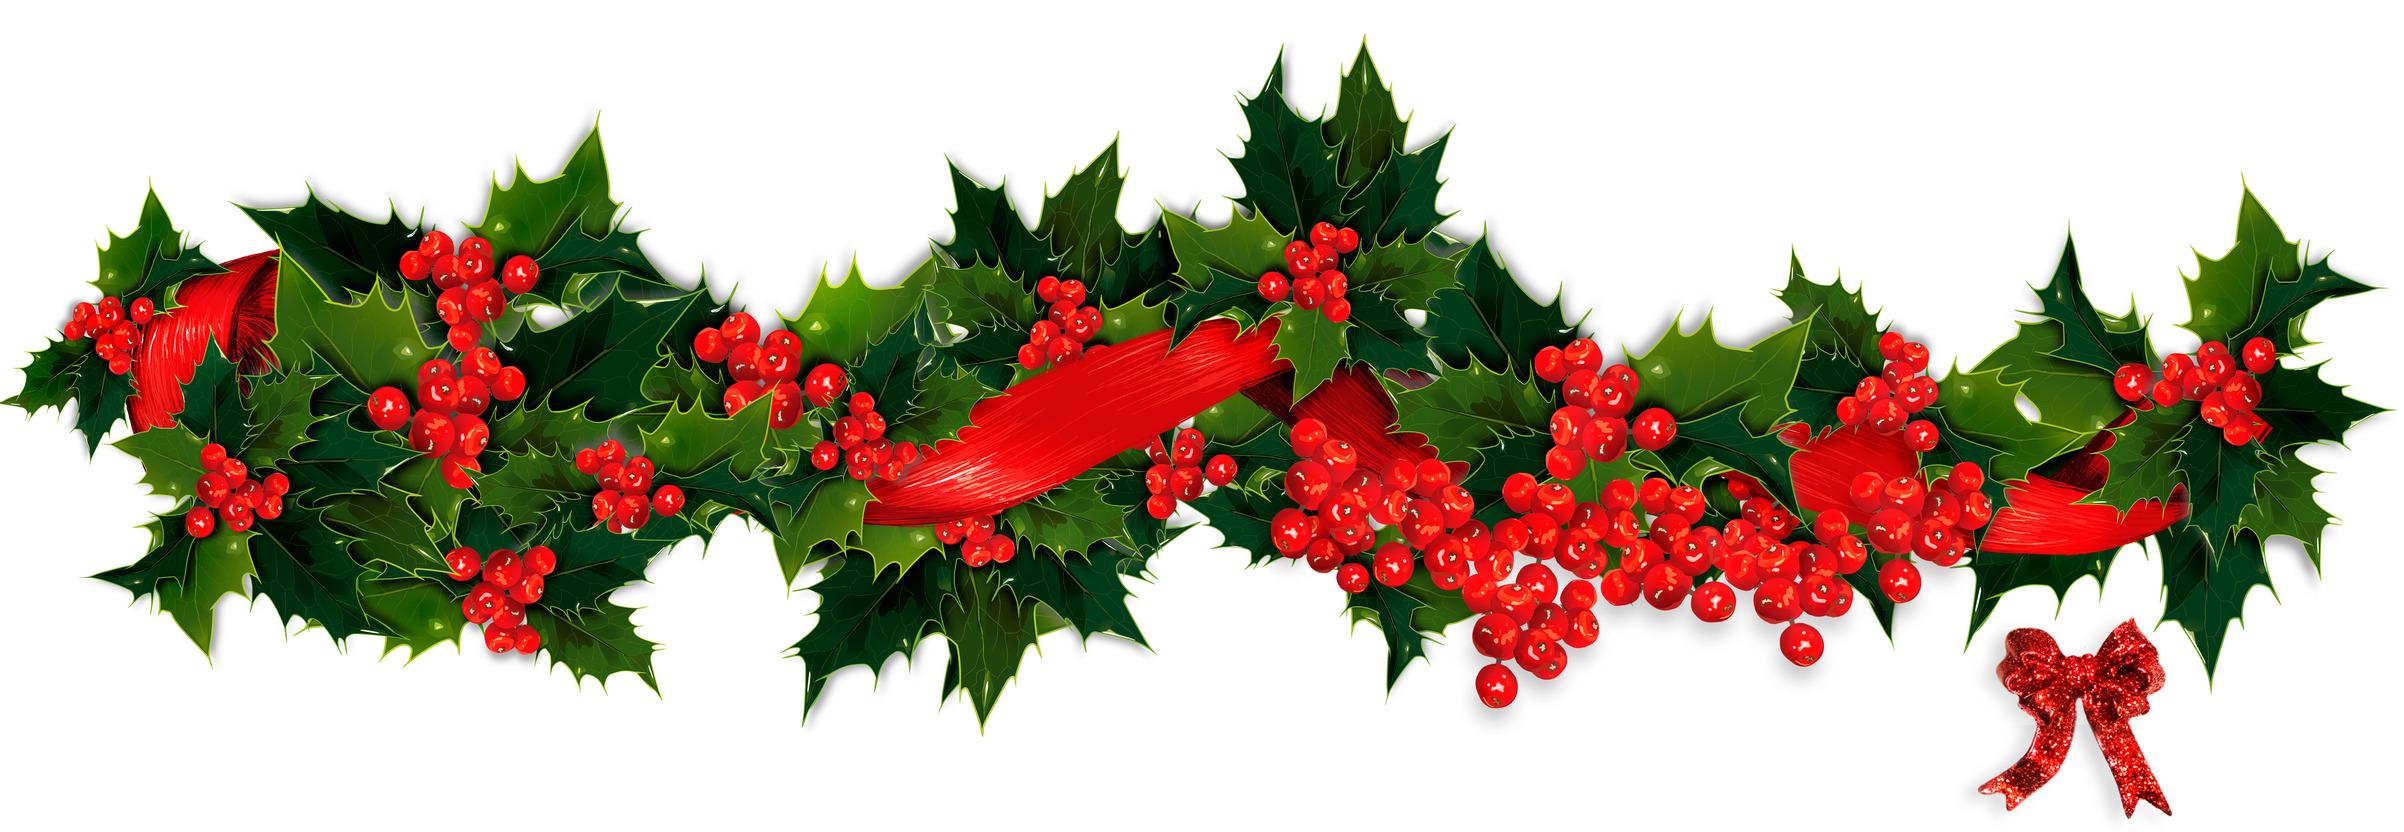 2404x832 Holiday Garland Christmas Garland Clip Art Merry Christmas